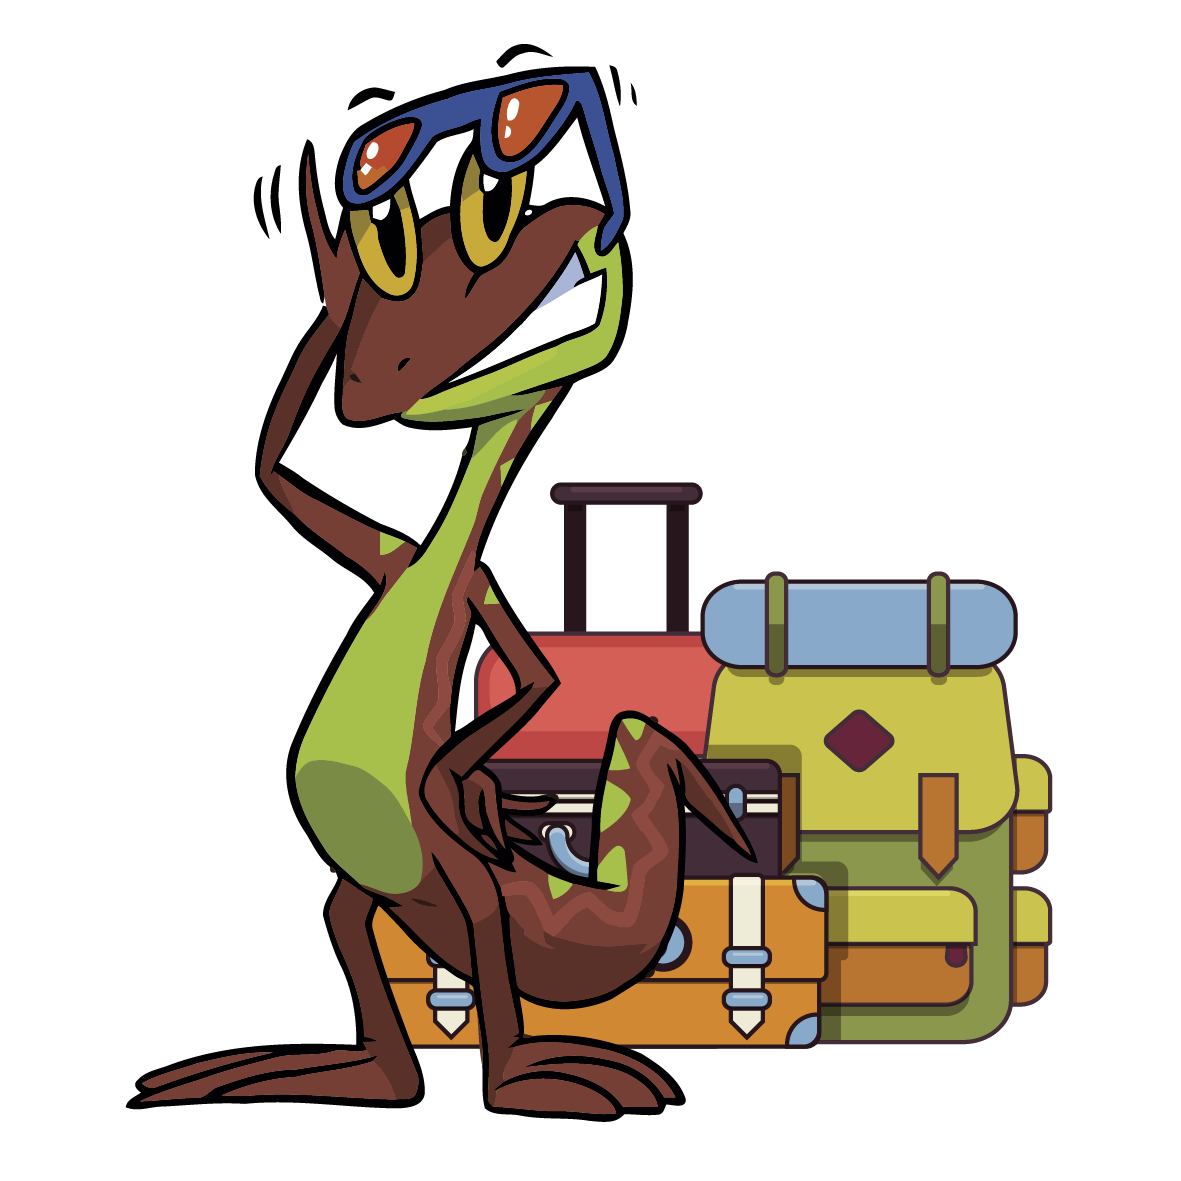 Mascote PipaAventura